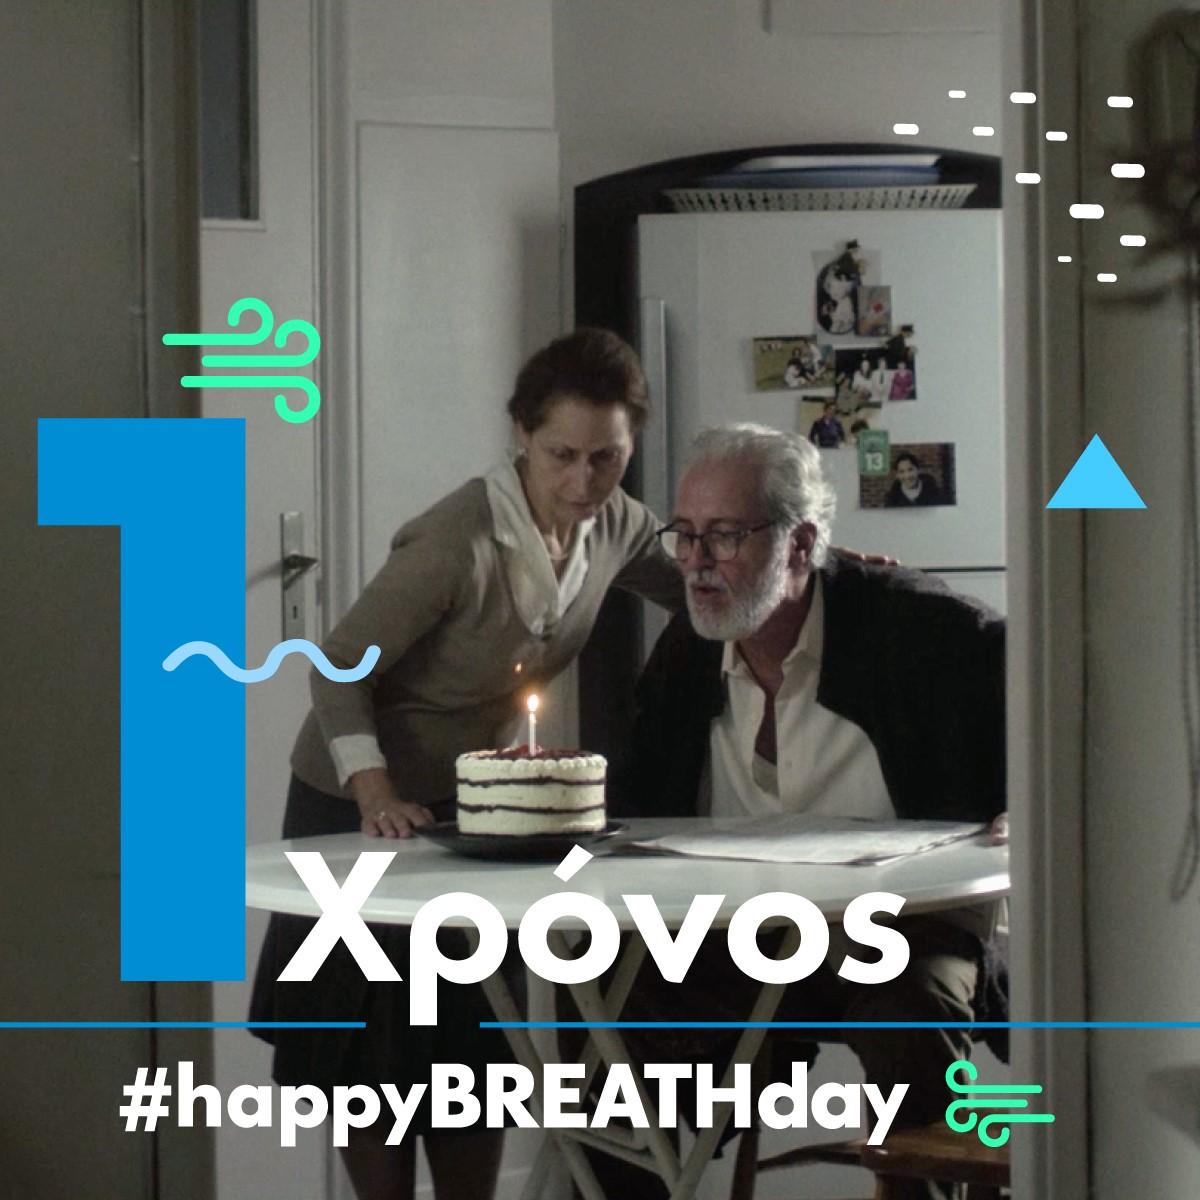 #happyBREATHday καμπάνια: Οι ασθενείς με ΧΑΠ μπορούν να έχουν μια καλή ποιότητα ζωής